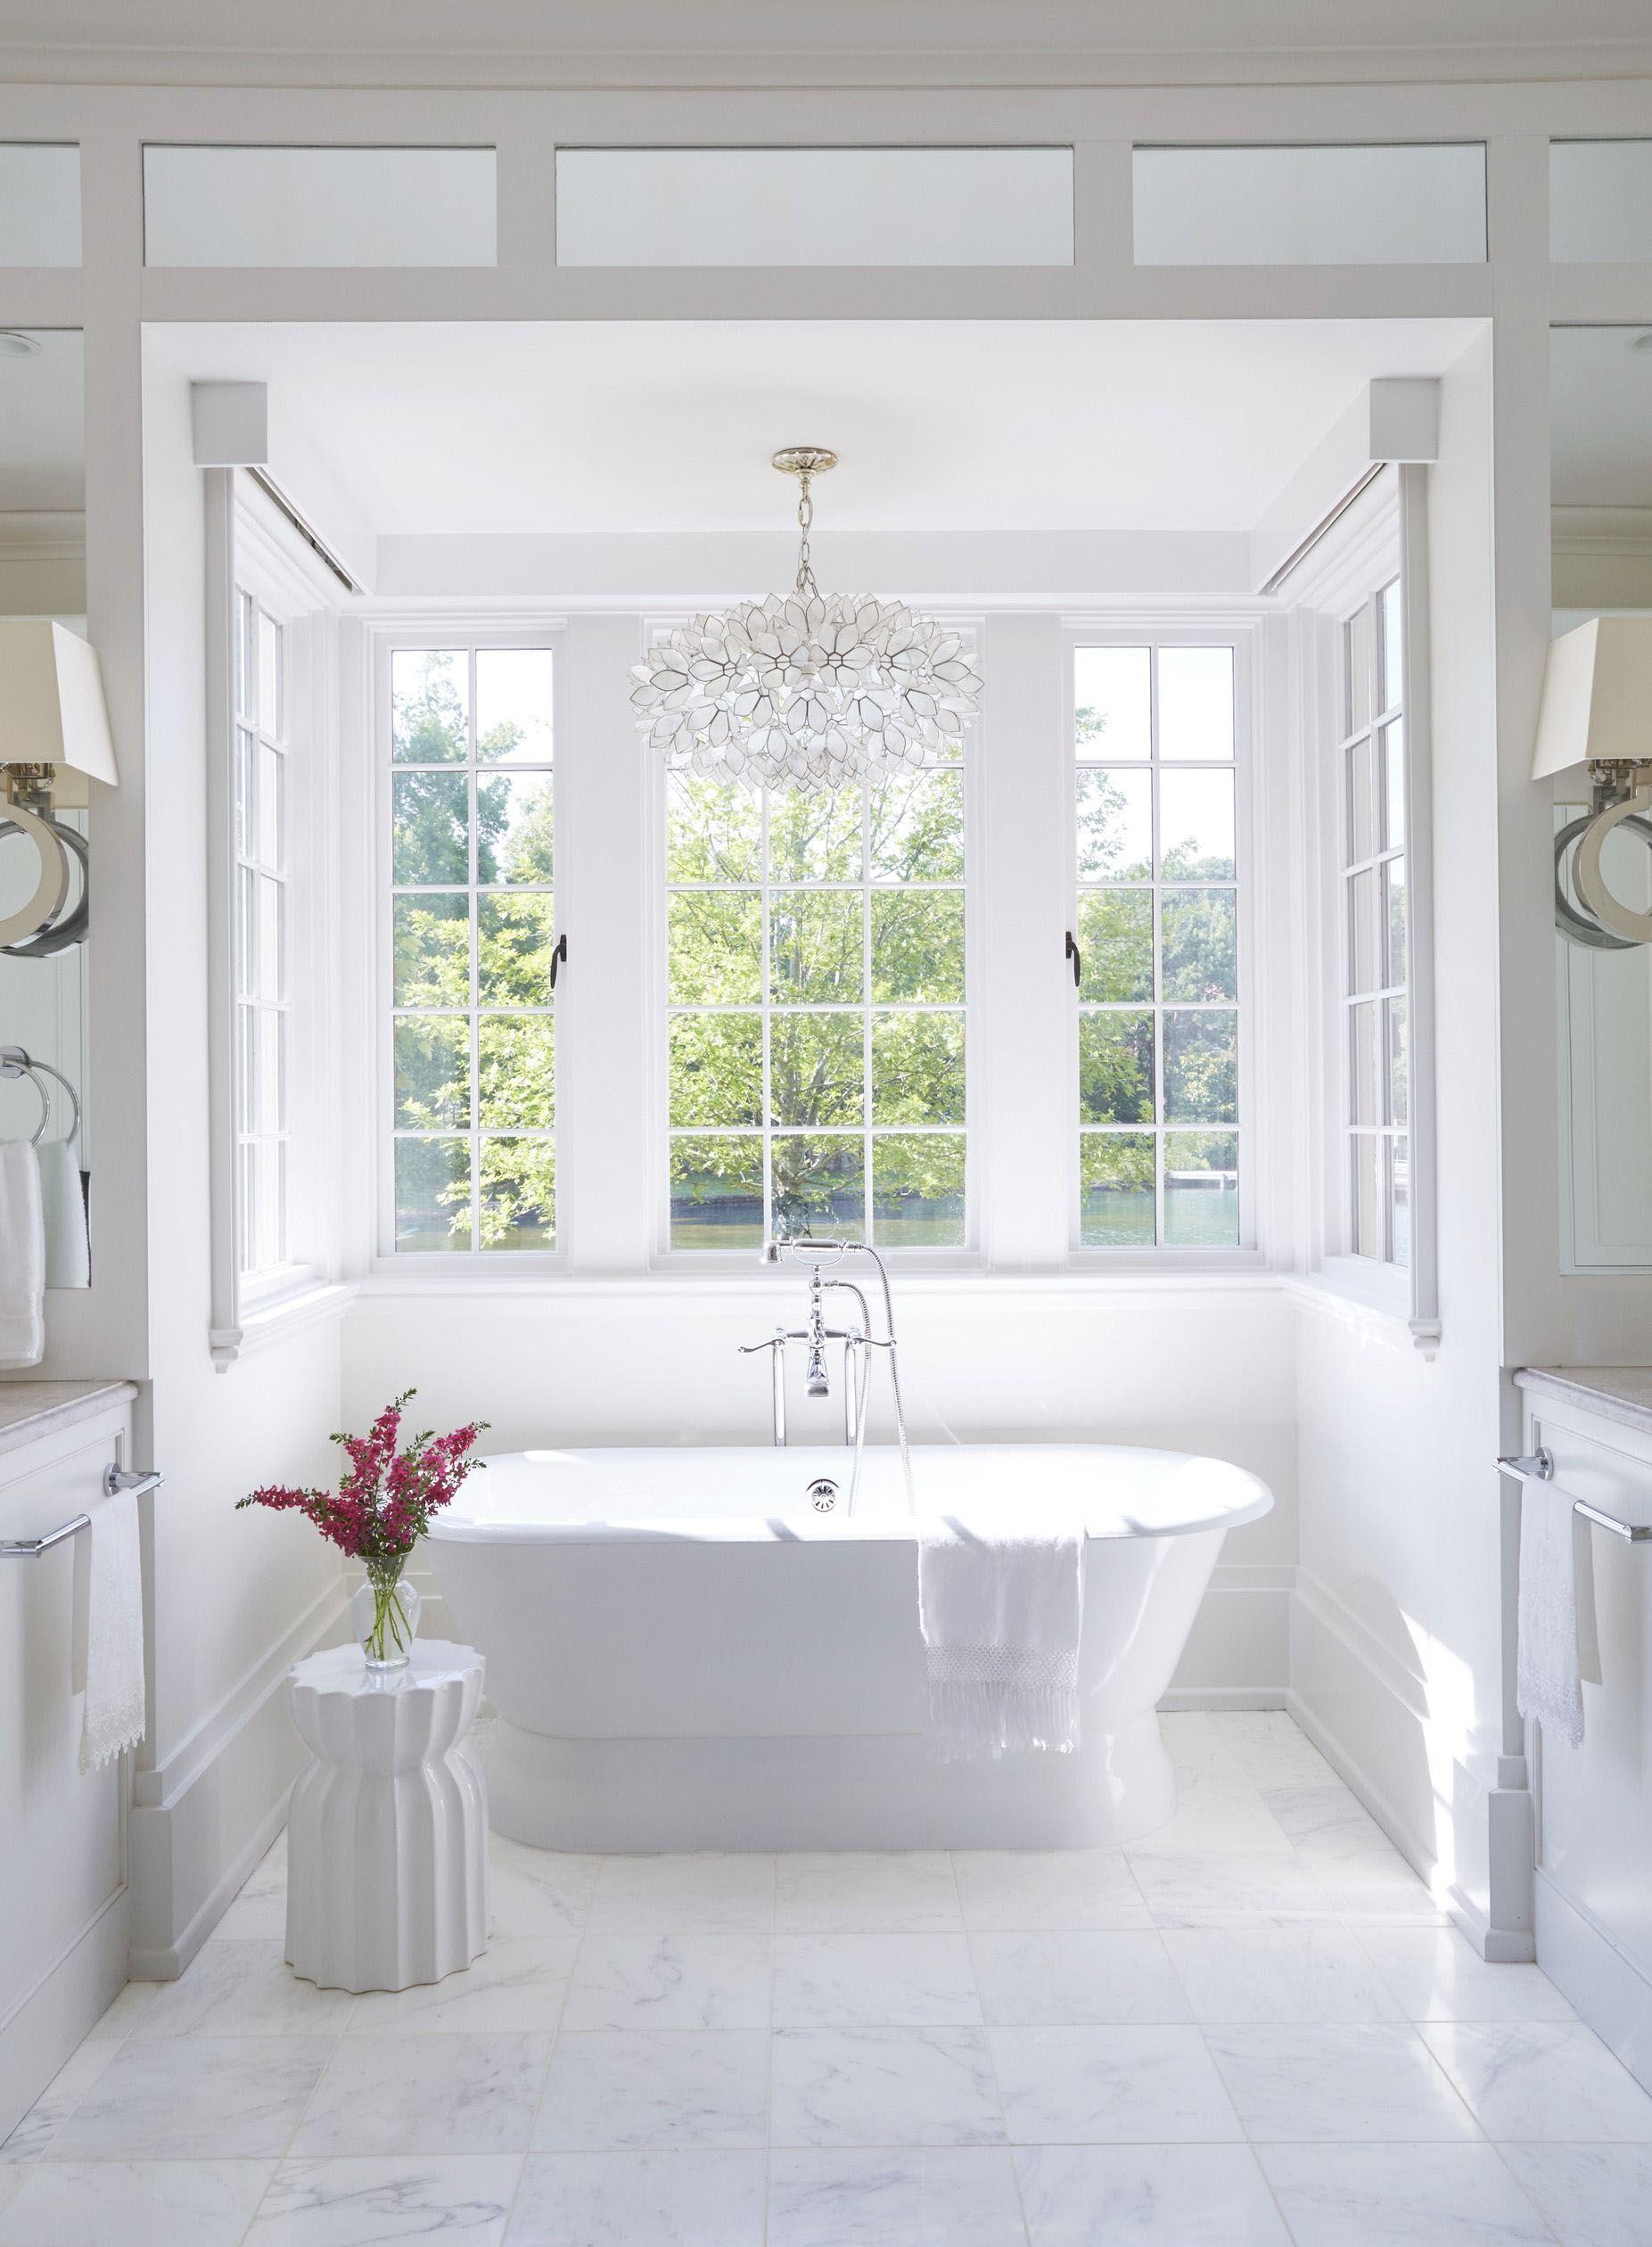 12 Brilliant Bathroom Light Fixture Ideas Modern Bathroom Lighting Home Depot Bathroom Bathroom Lighting